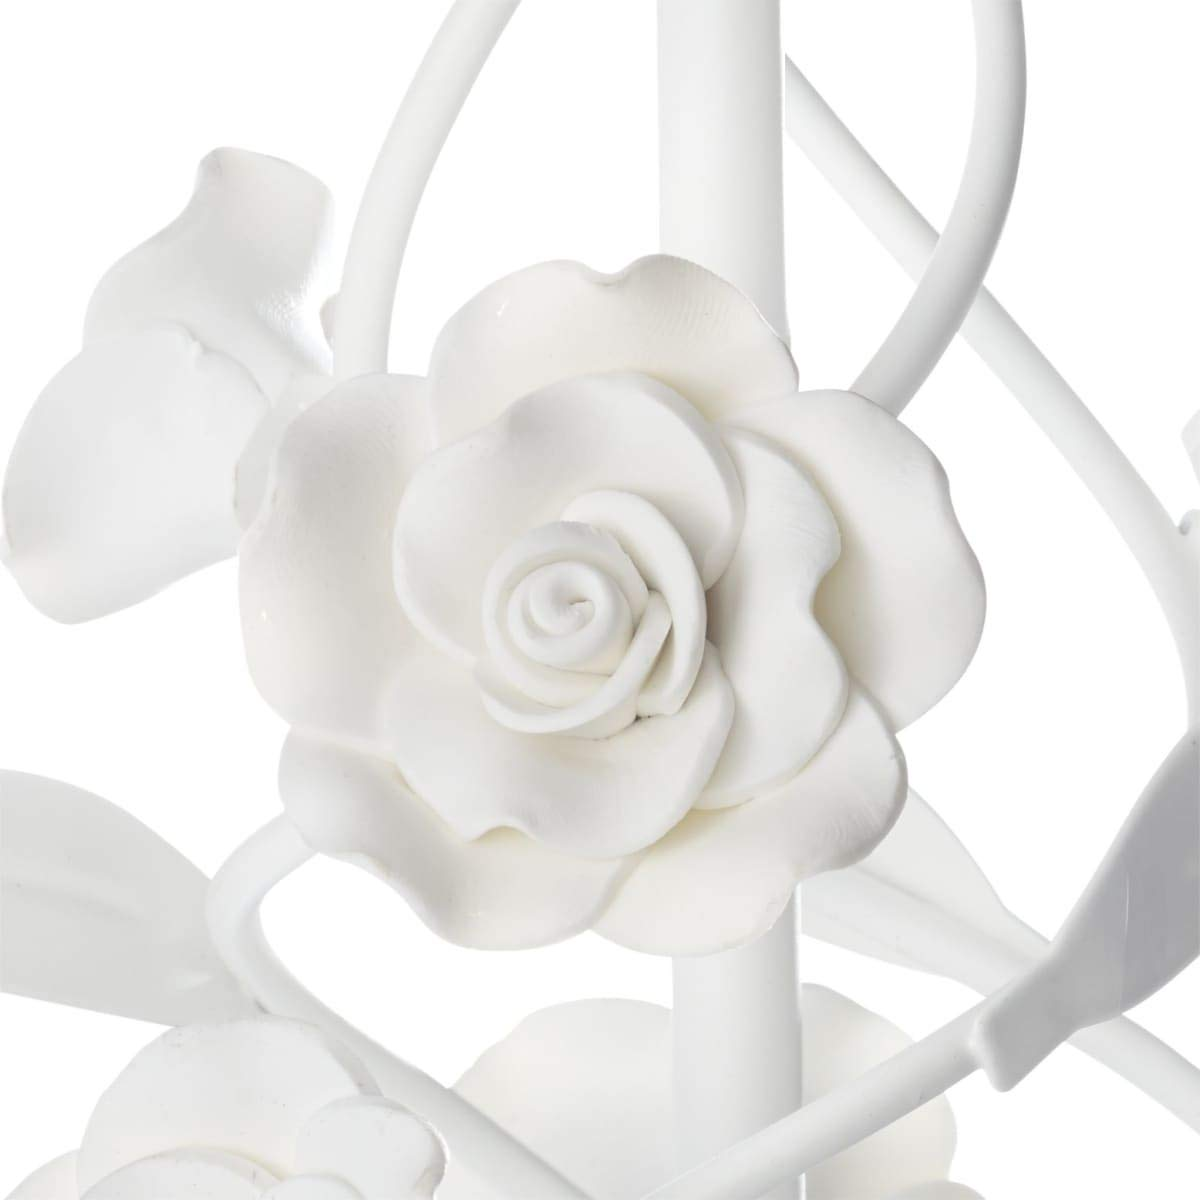 miaVILLA Kronleuchter Rose Weiß 5-flammig E14//max 40 cm Ø PureDay 40W Romantik Look